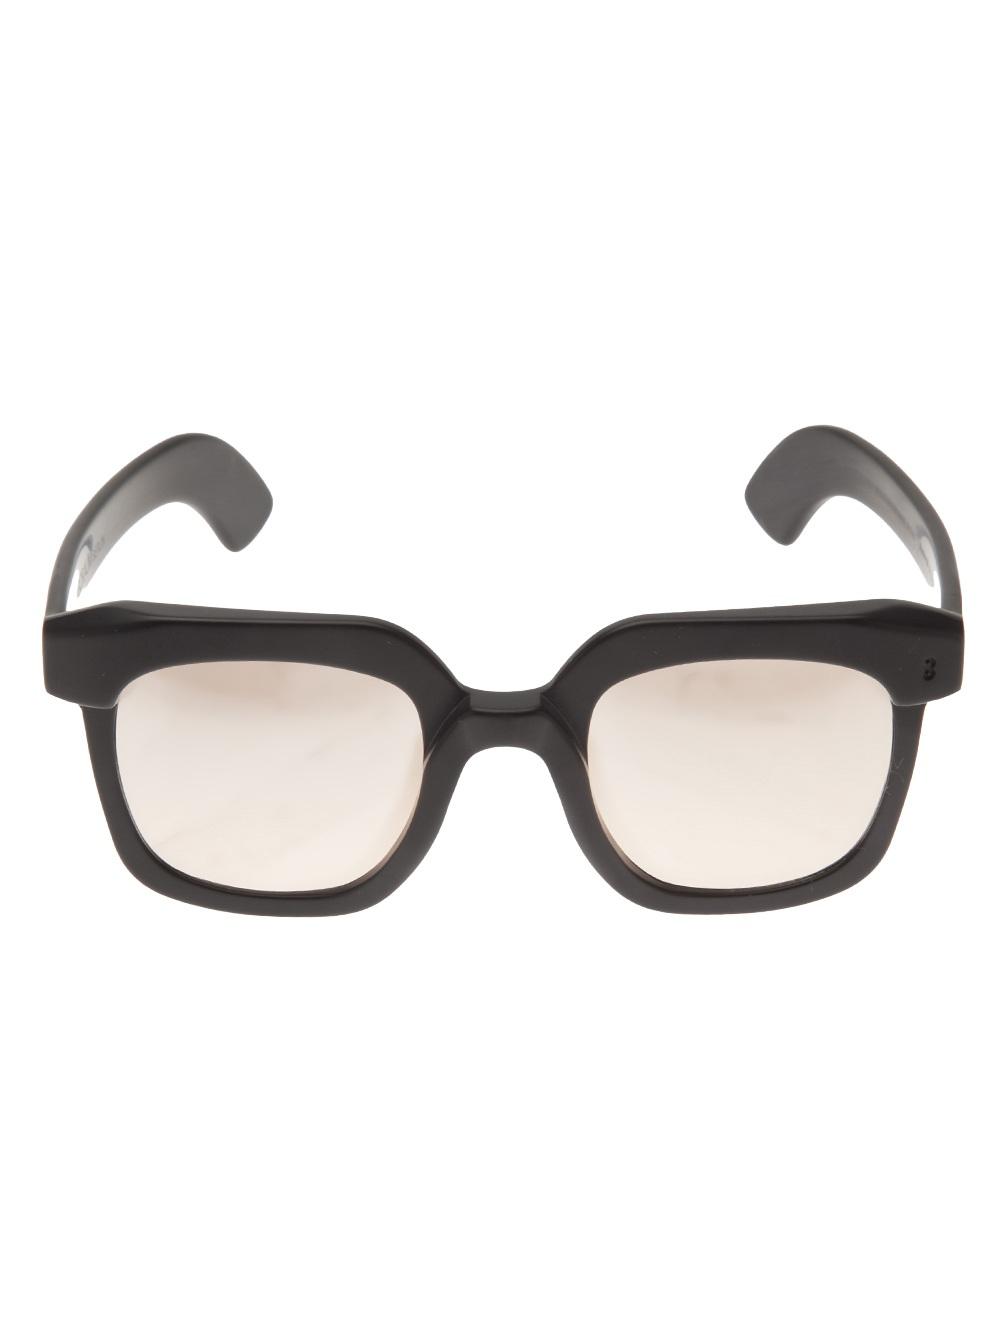 f1b6c74e5d7 Kuboraum Mask K7 Sunglasses in Black - Lyst